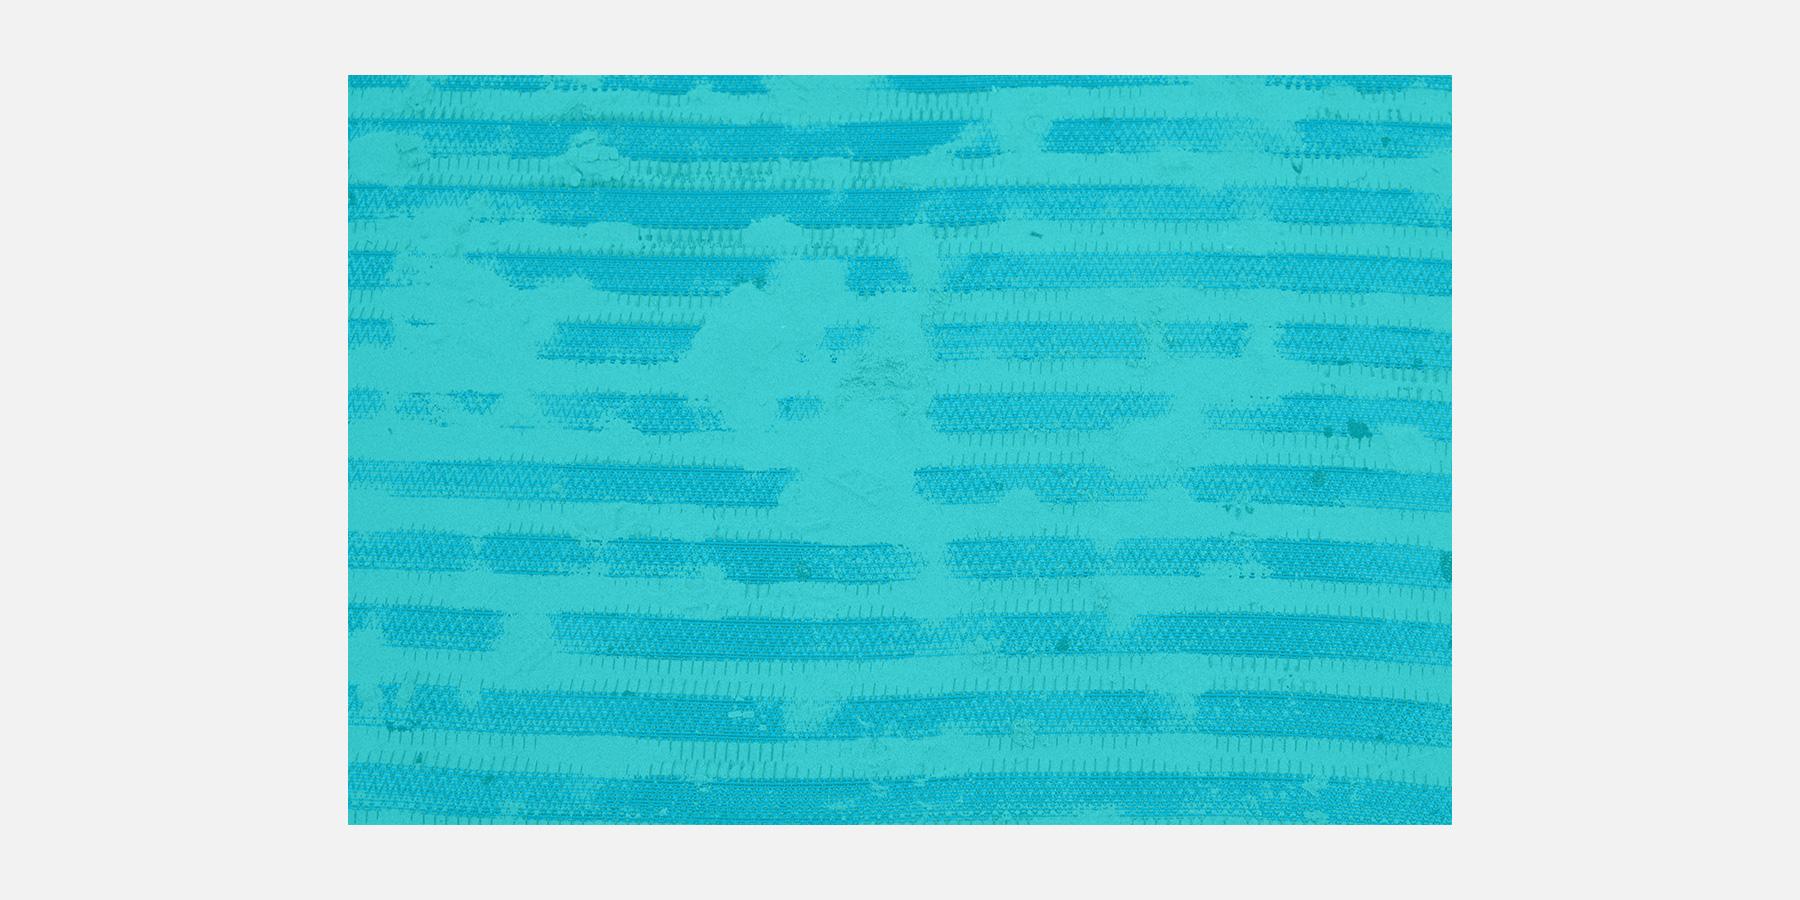 Blue print background.